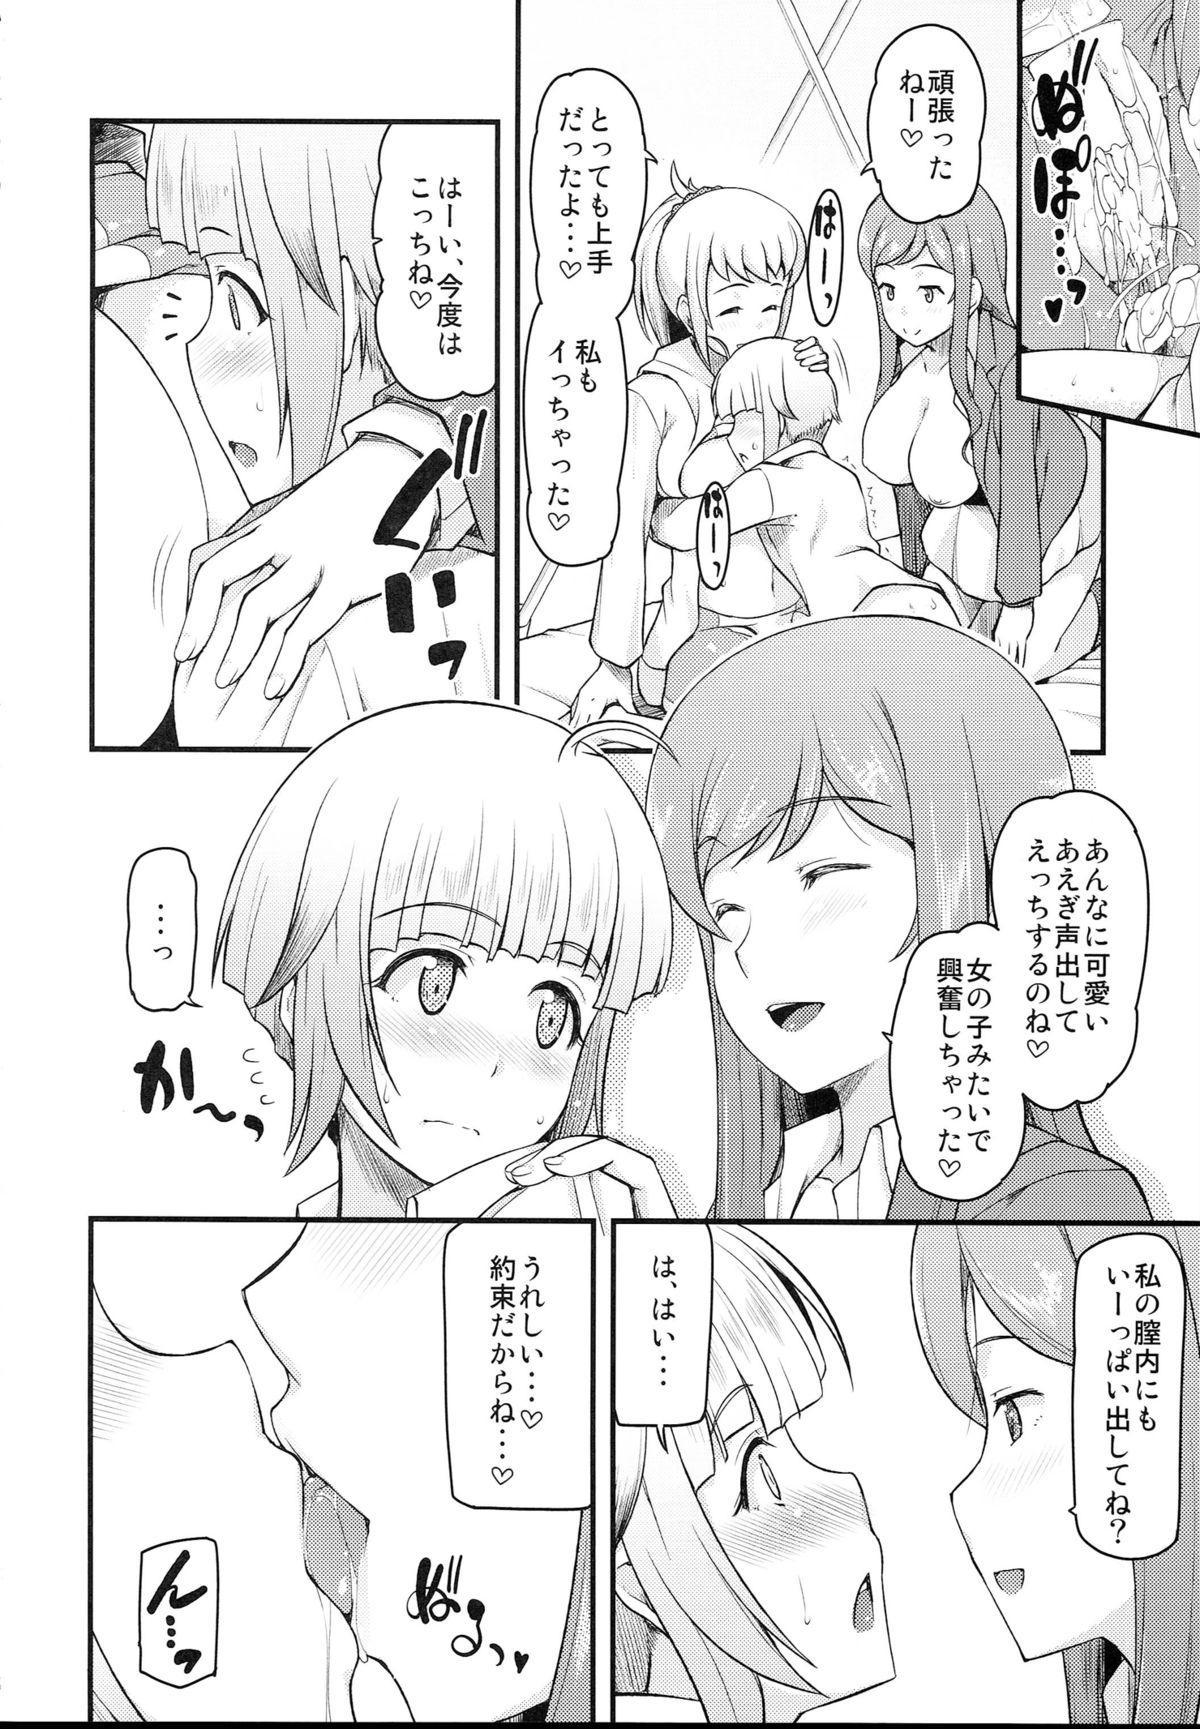 (C87) [from SCRATCH (Johnny) Amatoro Fighters Fumina senpai to Mirai oneechan no baai  (Gundam Build Fighters Try) 26